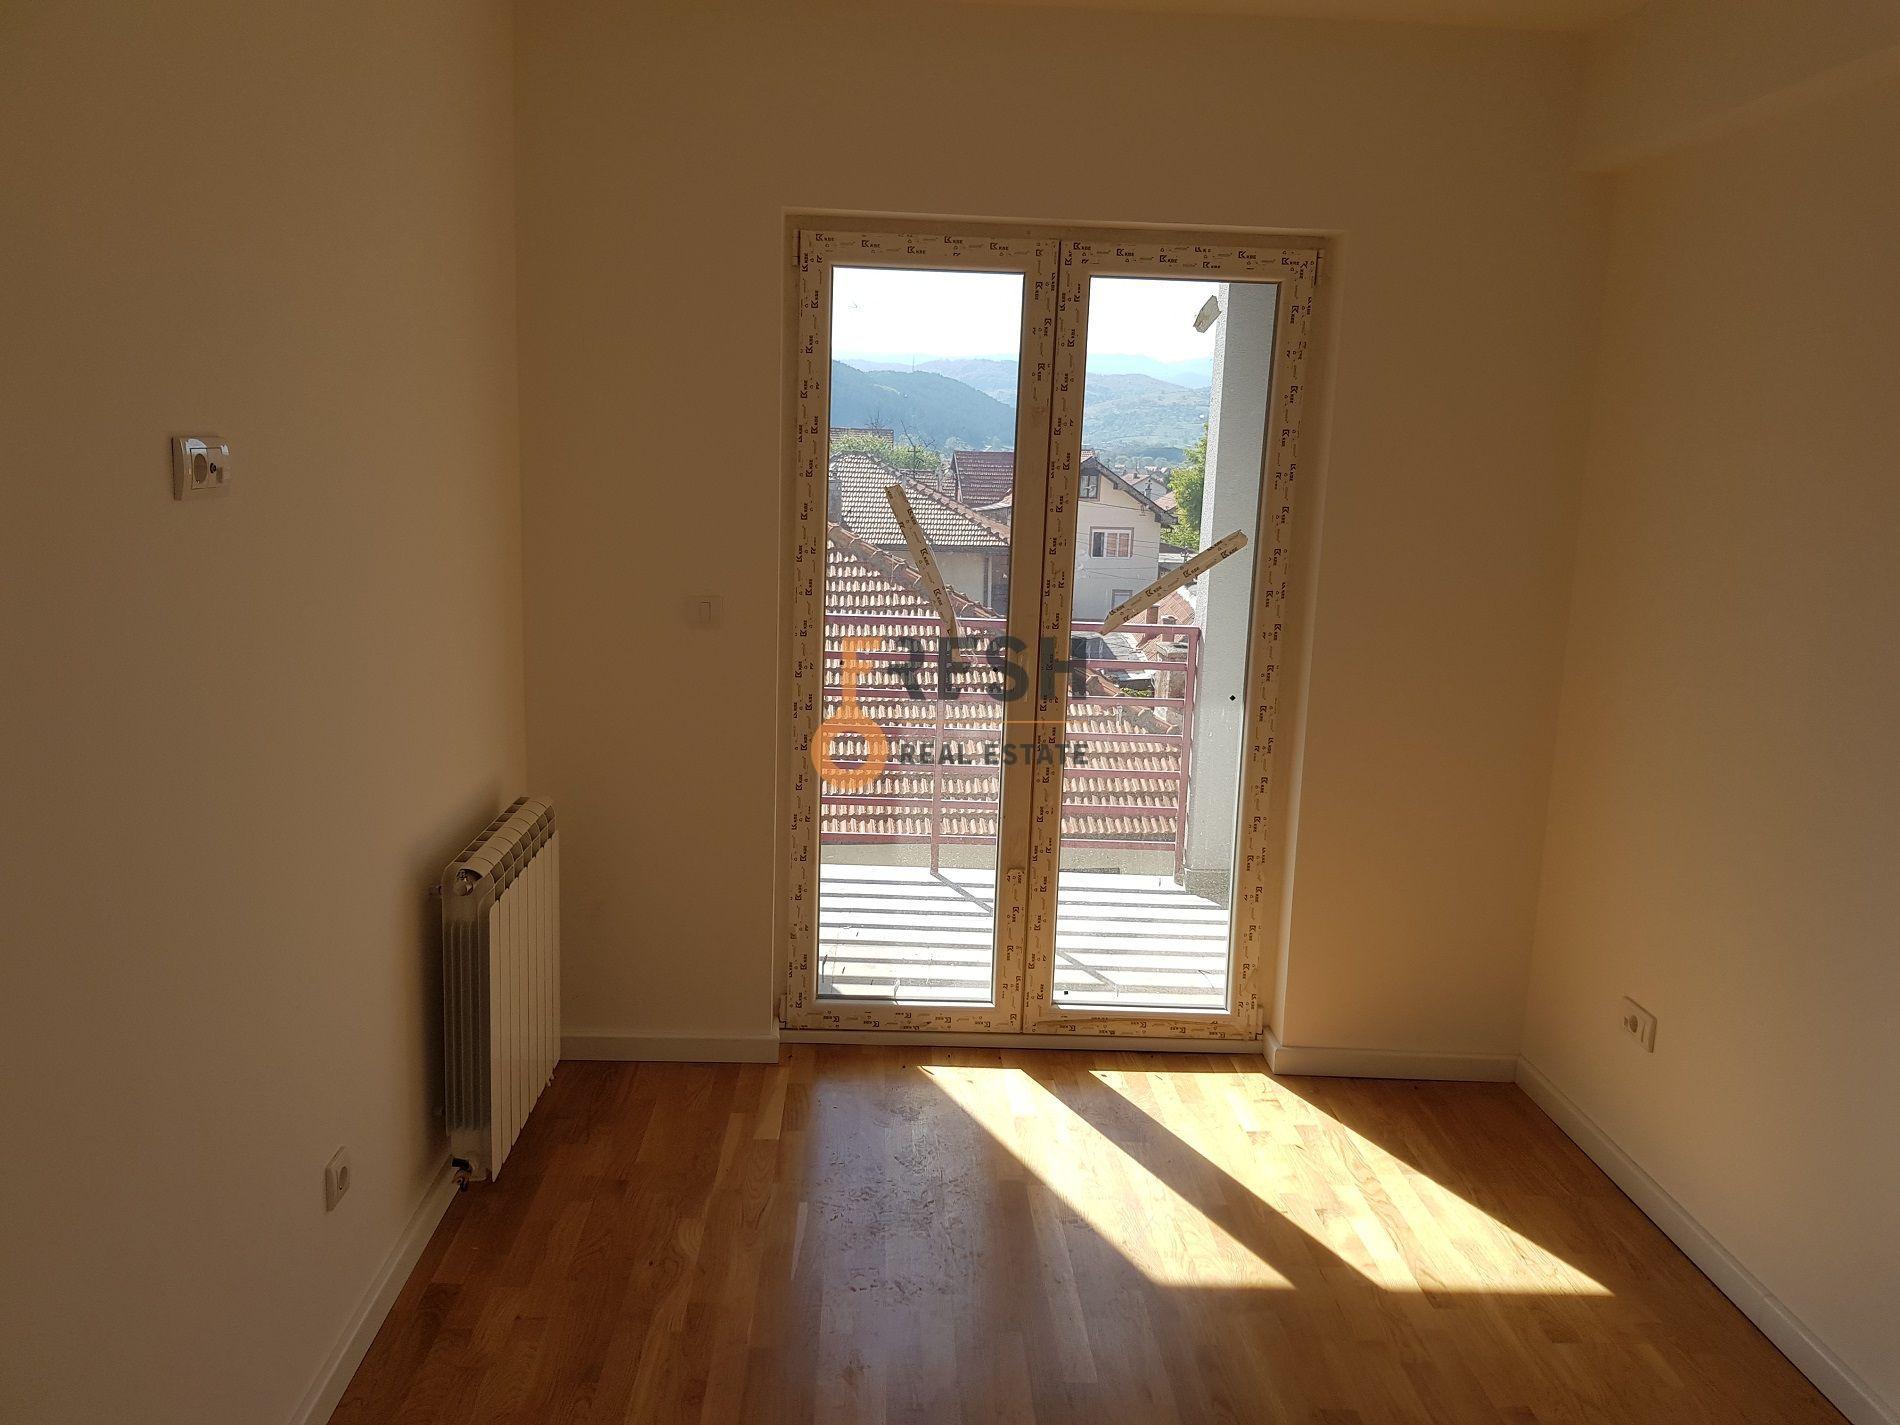 Jednosoban stan 45 m2, Centar, Pljevlja, Prodaja - 10